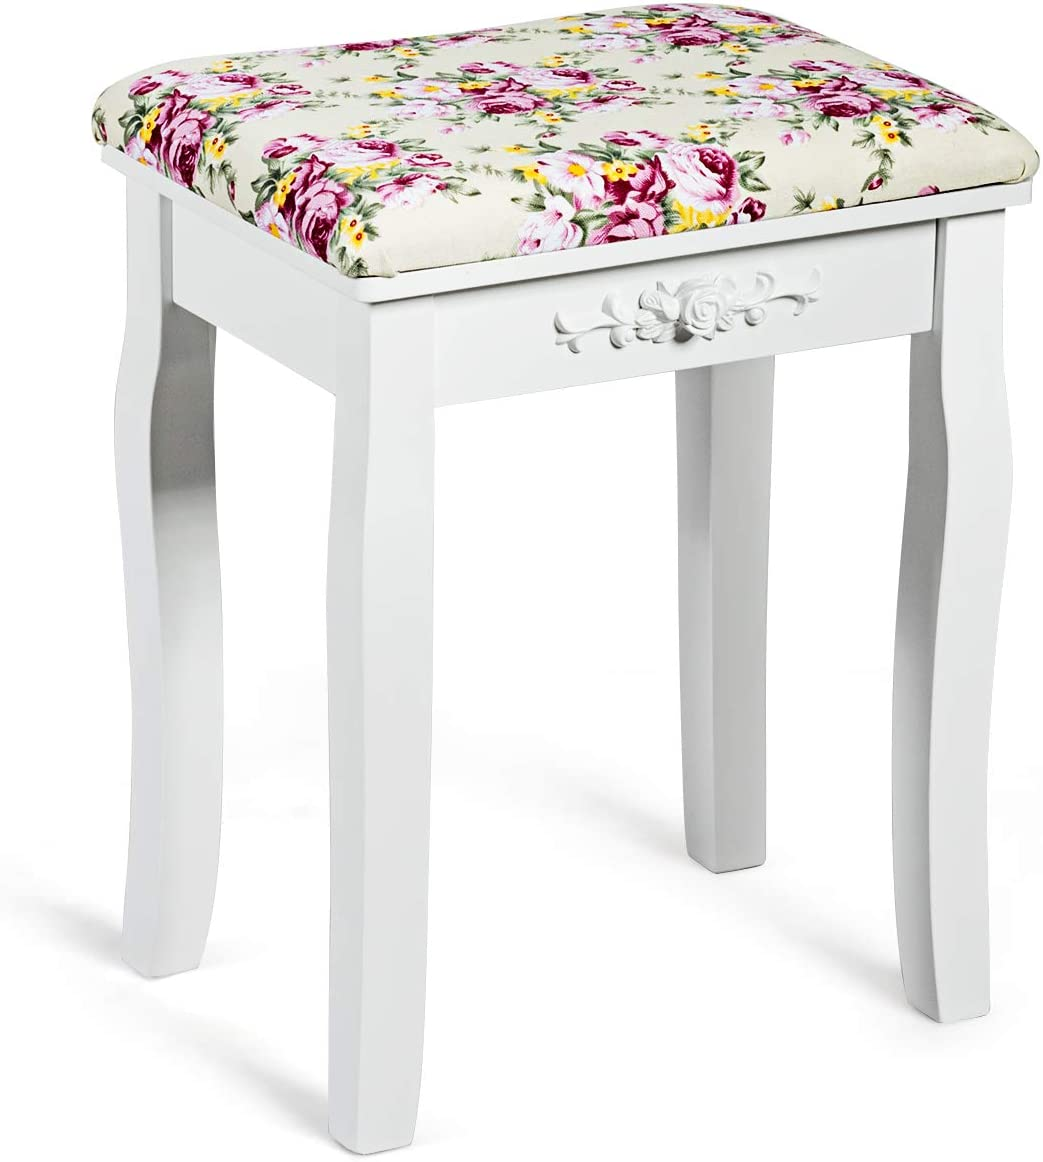 Giantex Nashville-Davidson Mall Vanity Stool Wood Dressing Padded Makeup Chair Sea Recommendation Piano